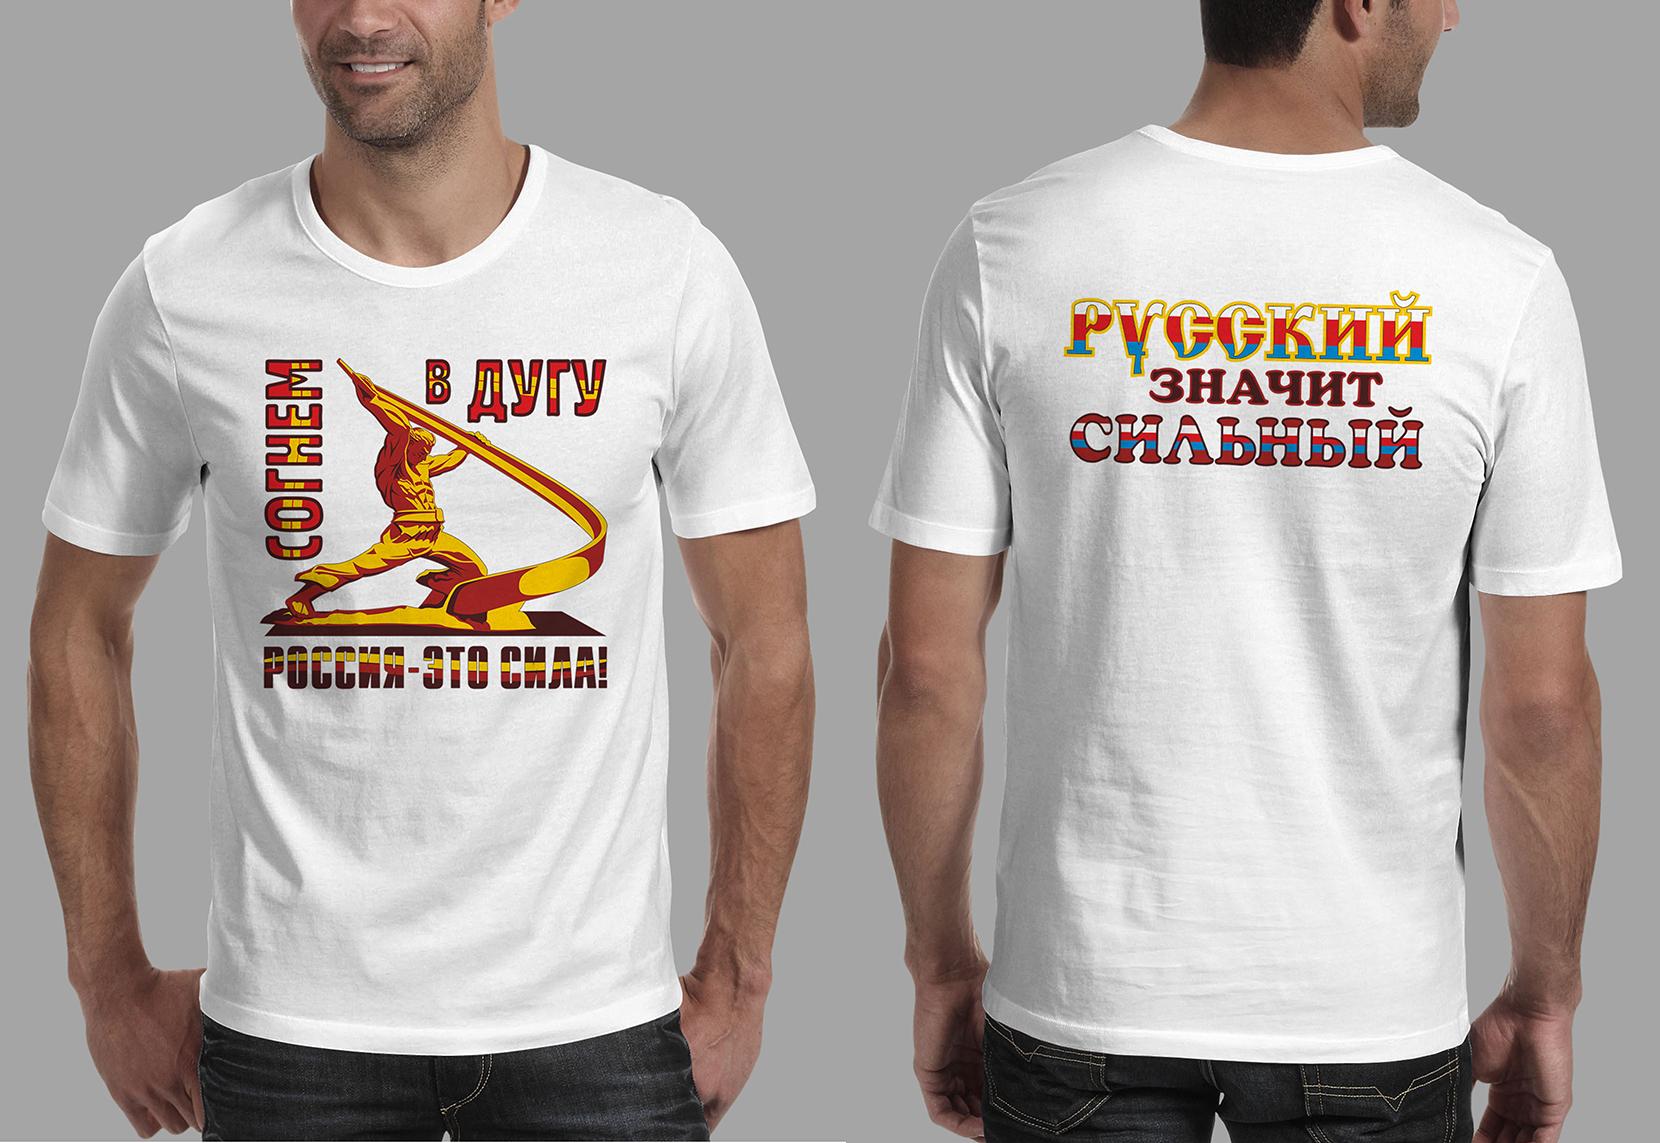 Конкурс принтов на футболки! 1 место 4000р., 2 место 2000р. фото f_89559dd6135ab11e.jpg